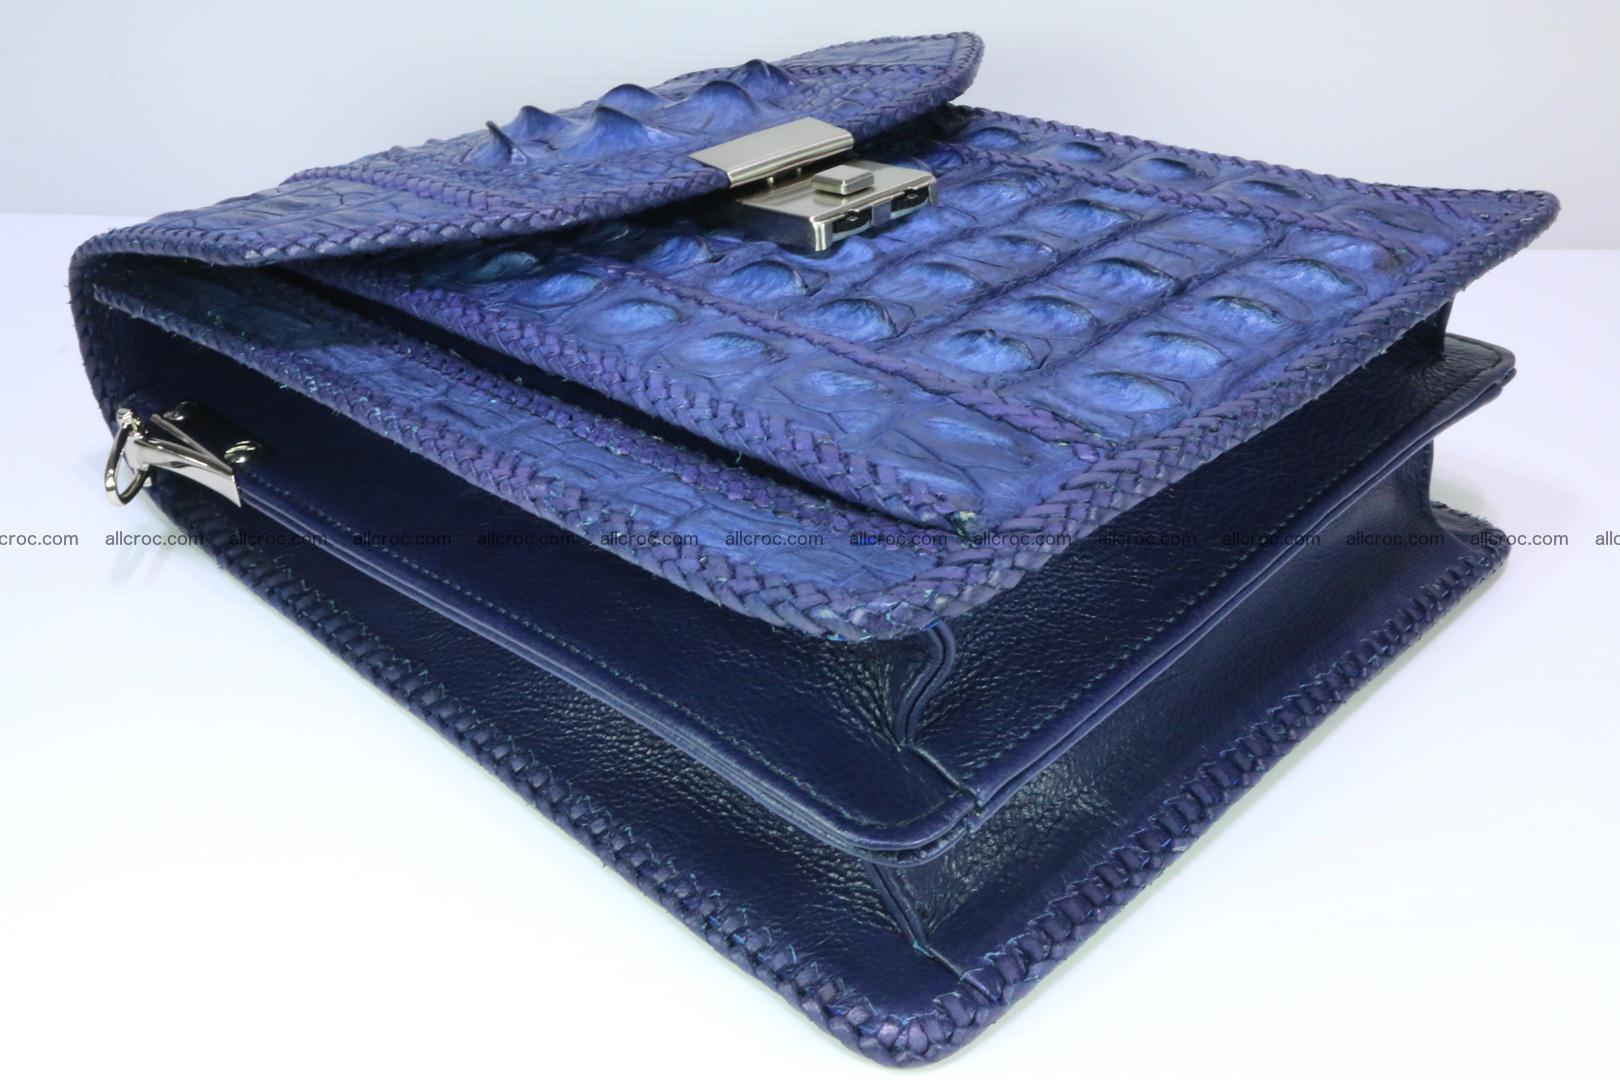 Crocodile skin messenger bag braided edges 419 Foto 7